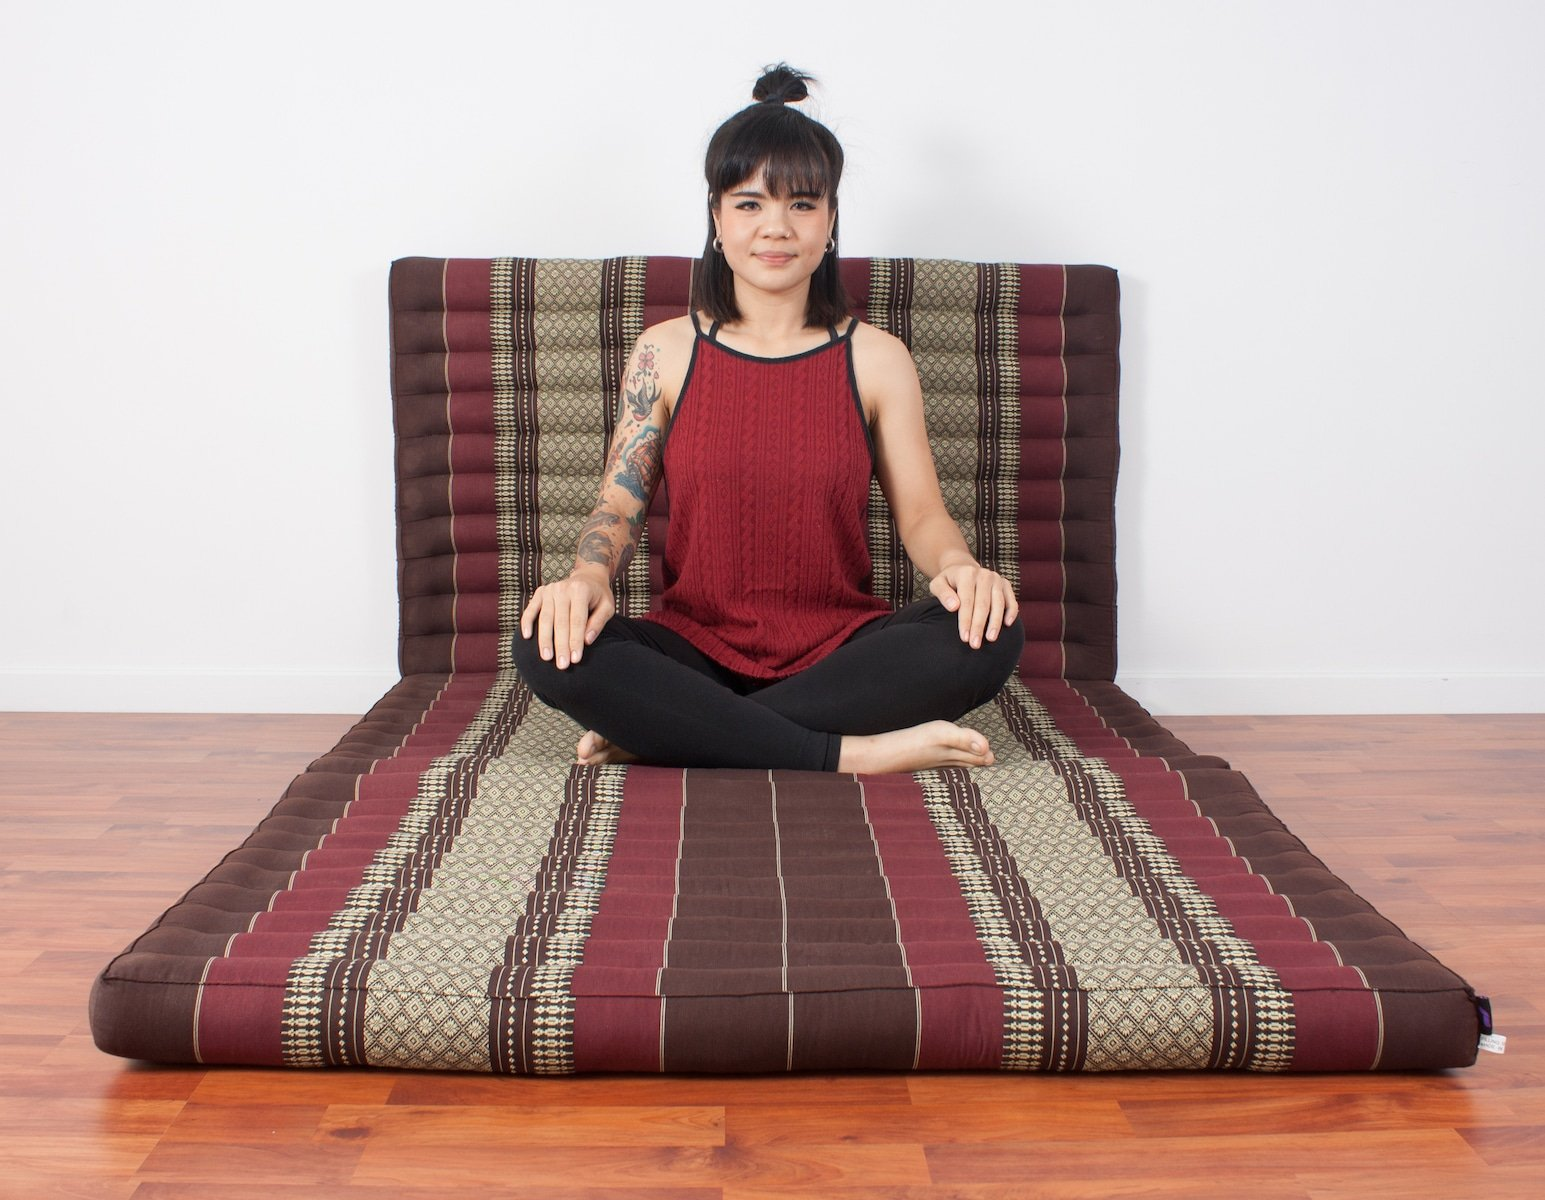 Leewadee Thai Massage Mat XL, 82x46x3 inches, Kapok, brown red by Leewadee (Image #2)